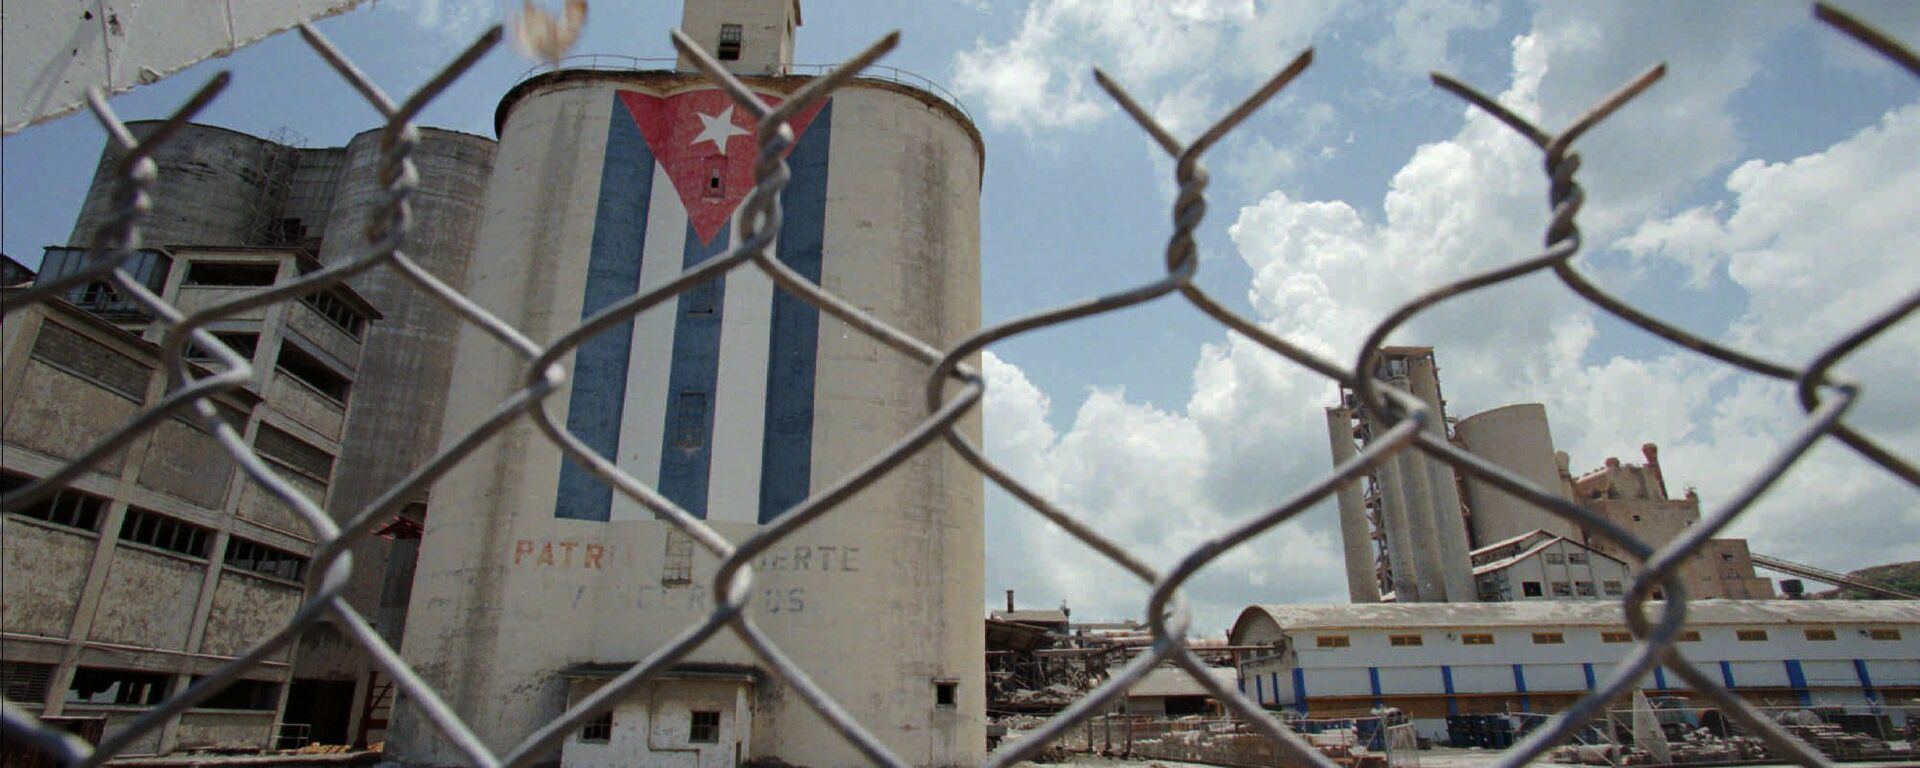 Bandera de Cuba - Sputnik Mundo, 1920, 12.03.2021